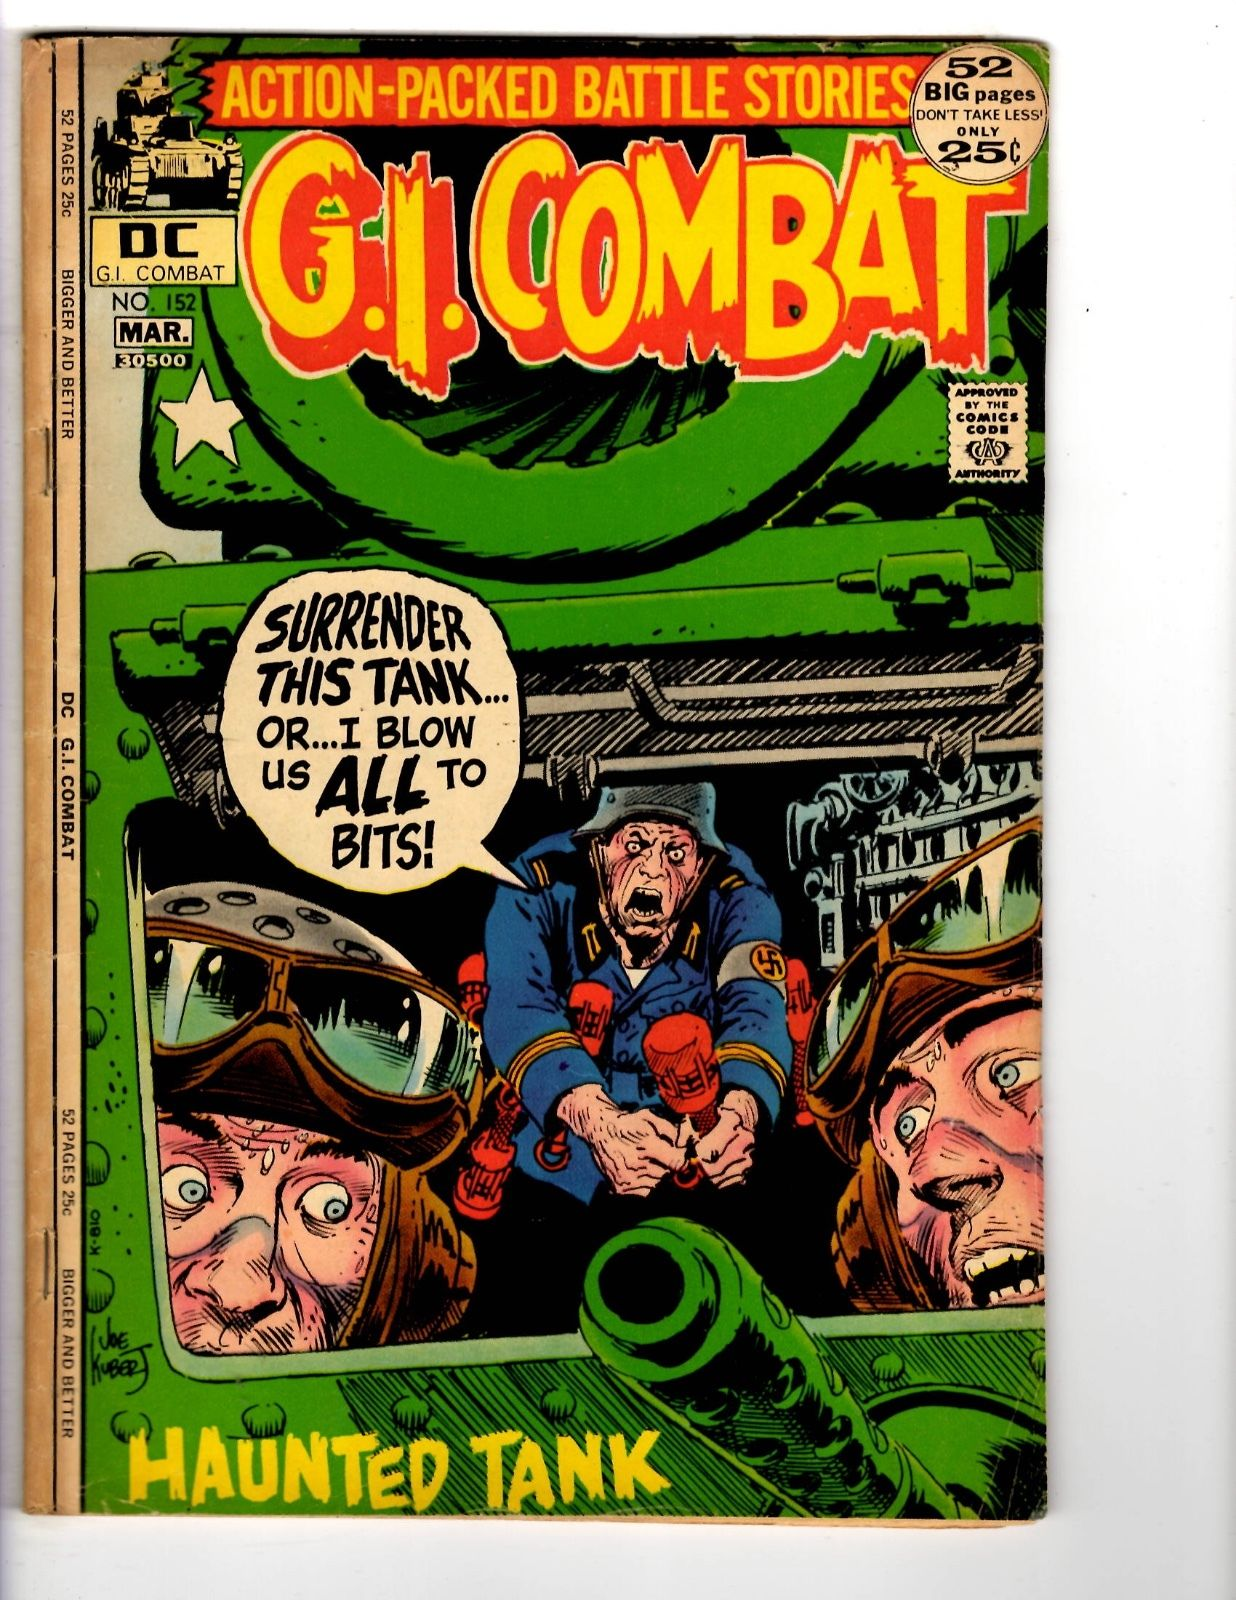 3 gi combat dc comic books 123 150 152 war comics wwii haunted save on more items publicscrutiny Choice Image